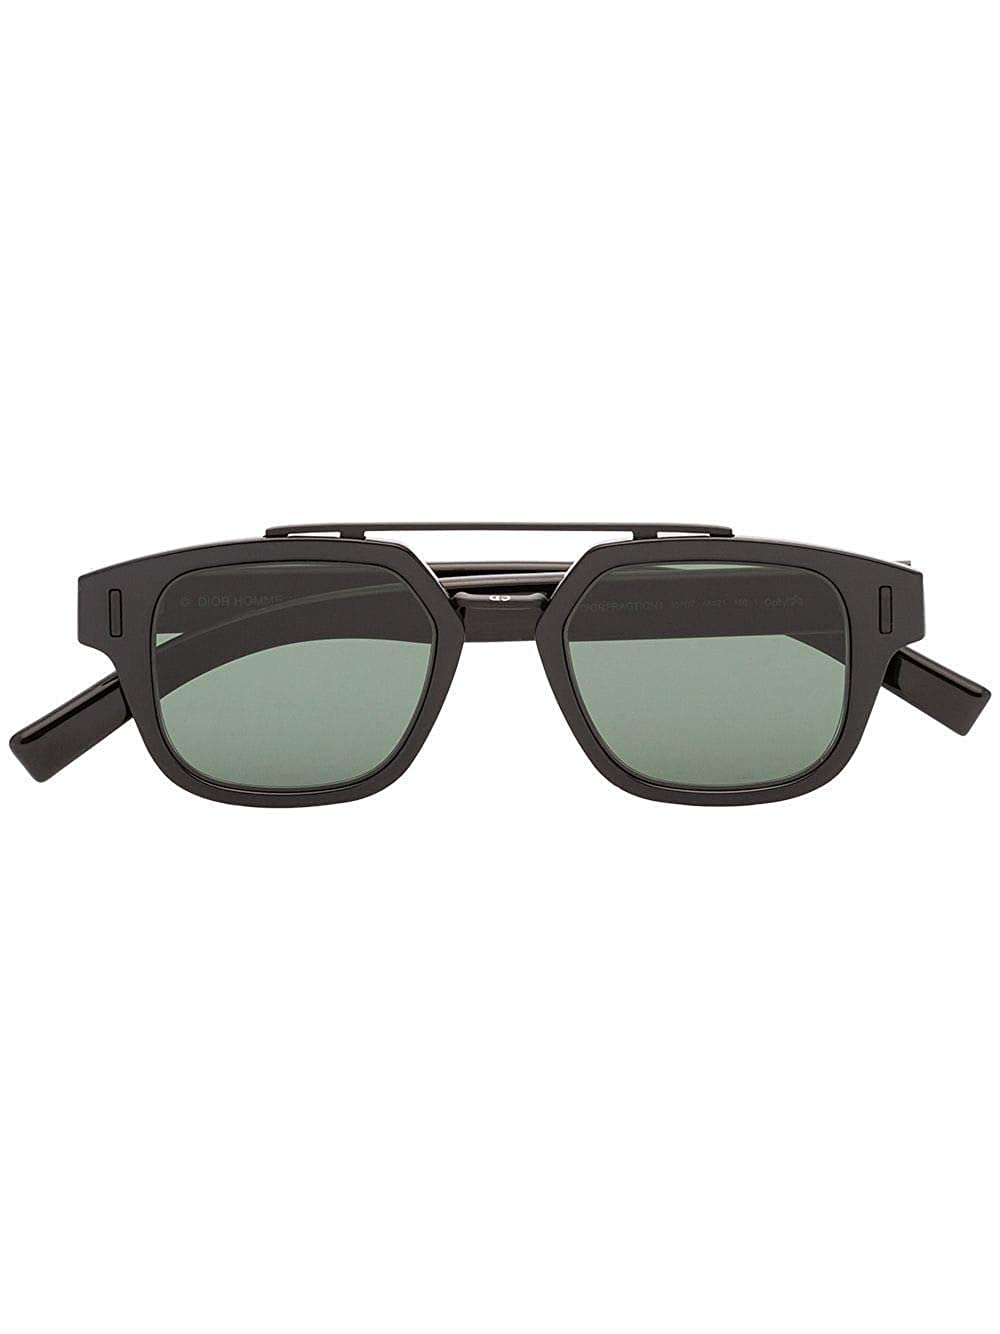 Christian Dior Homme DIORFRACTION1F 0T Gafas, Black/GN Green ...